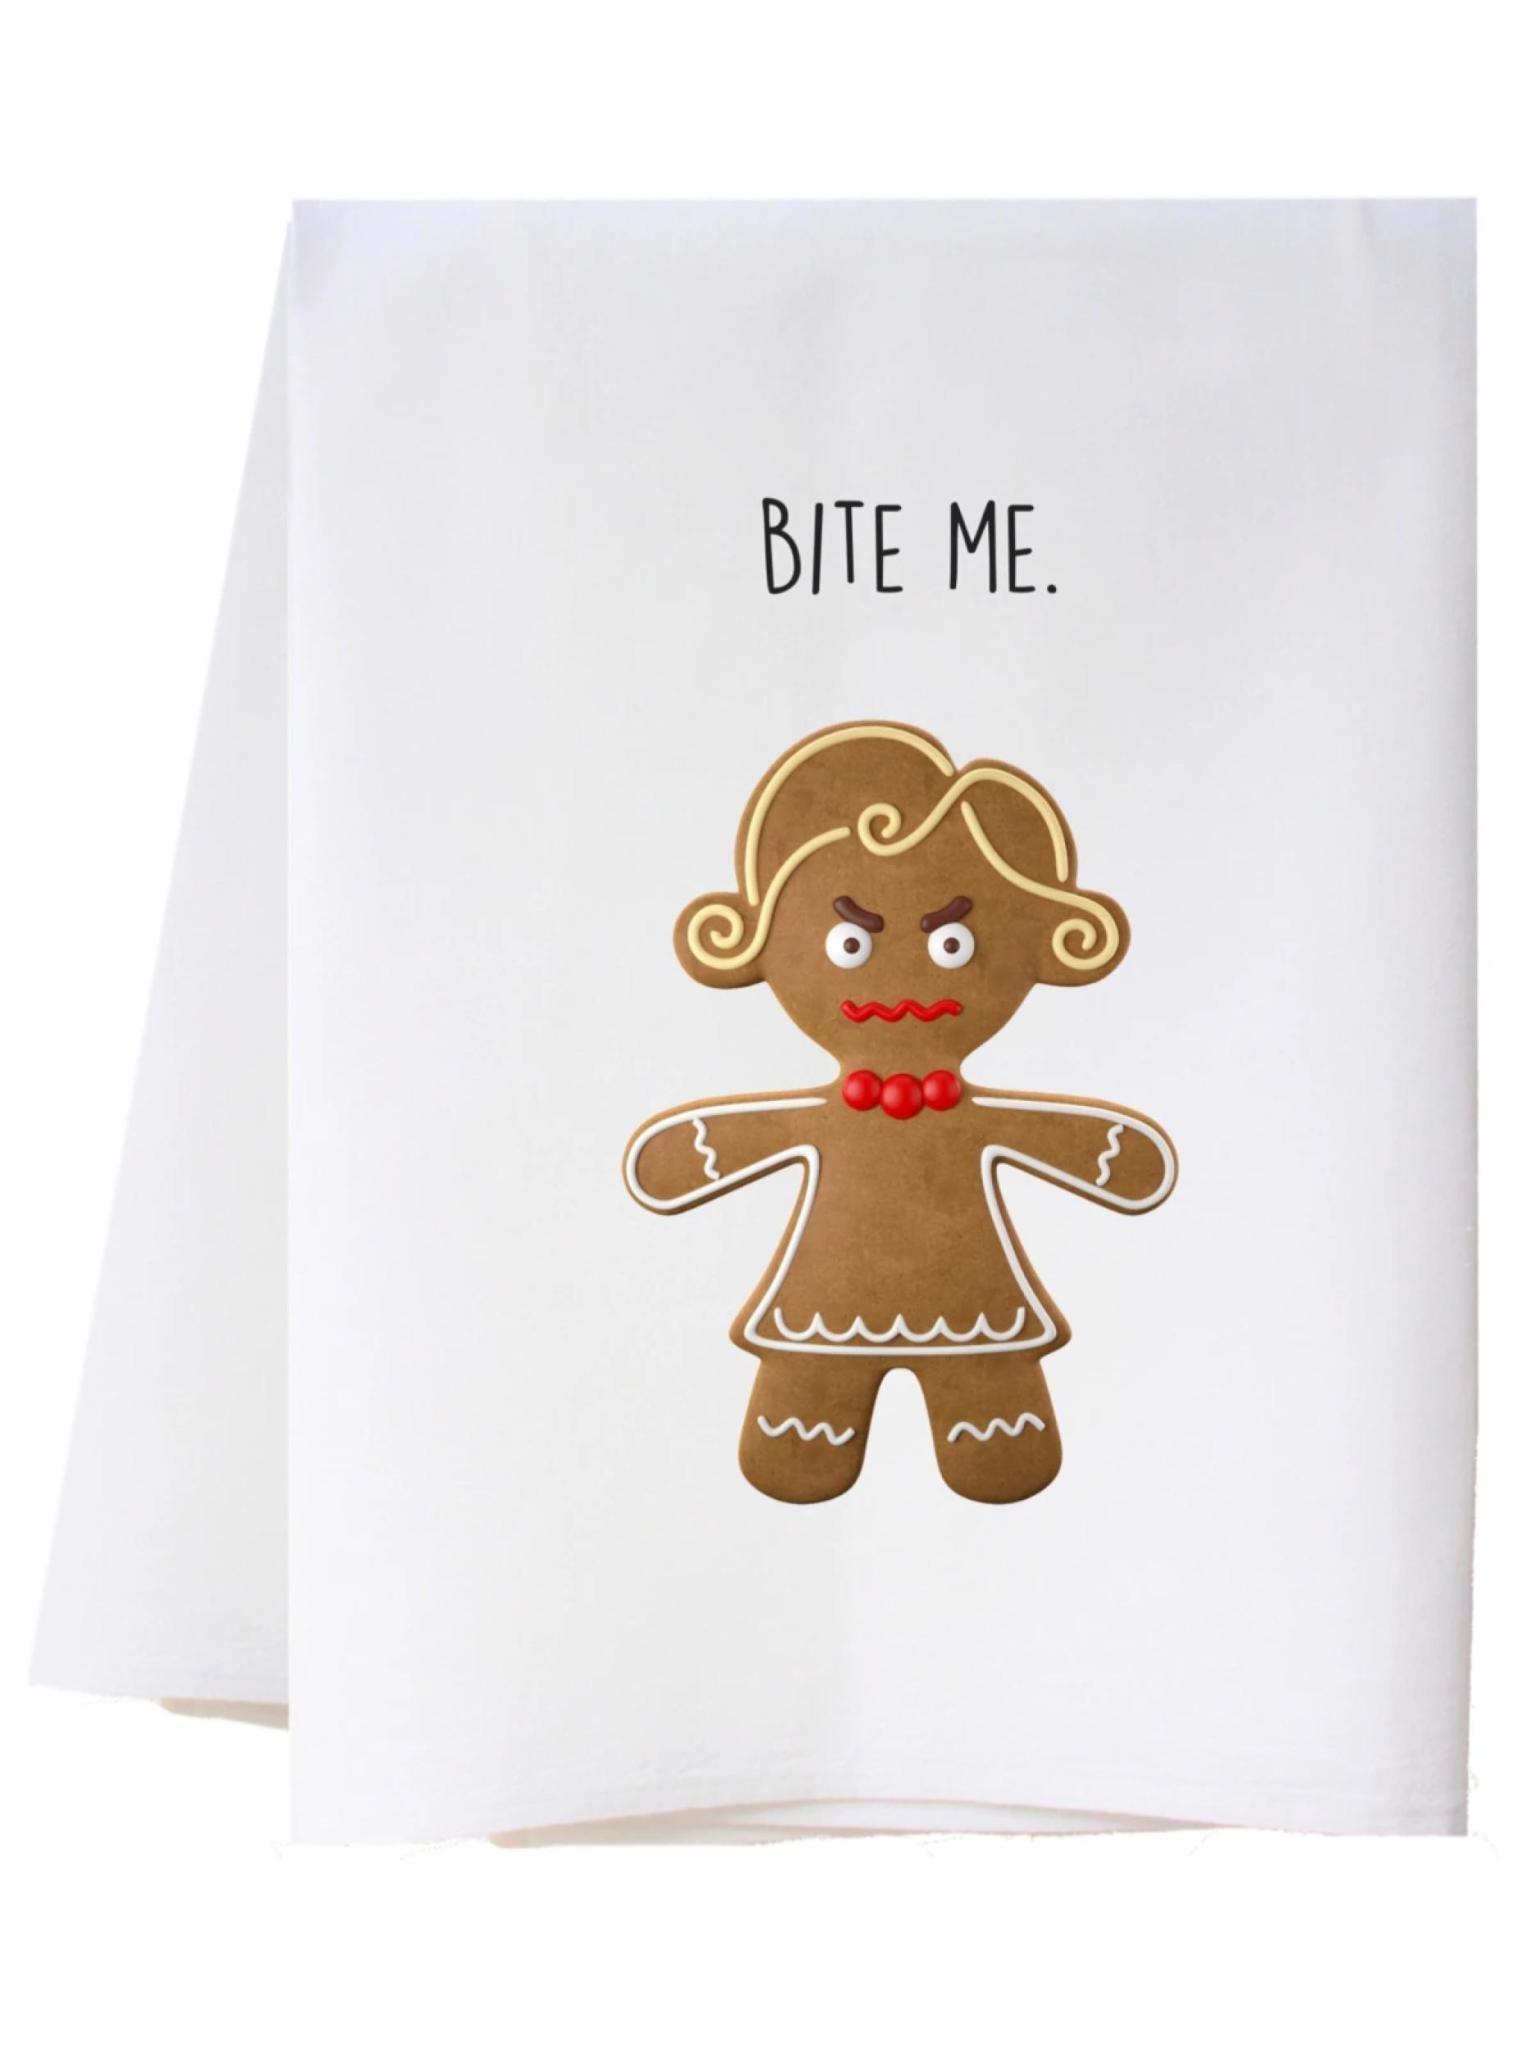 Southern Sisters Bite Me Flour Sack Towel